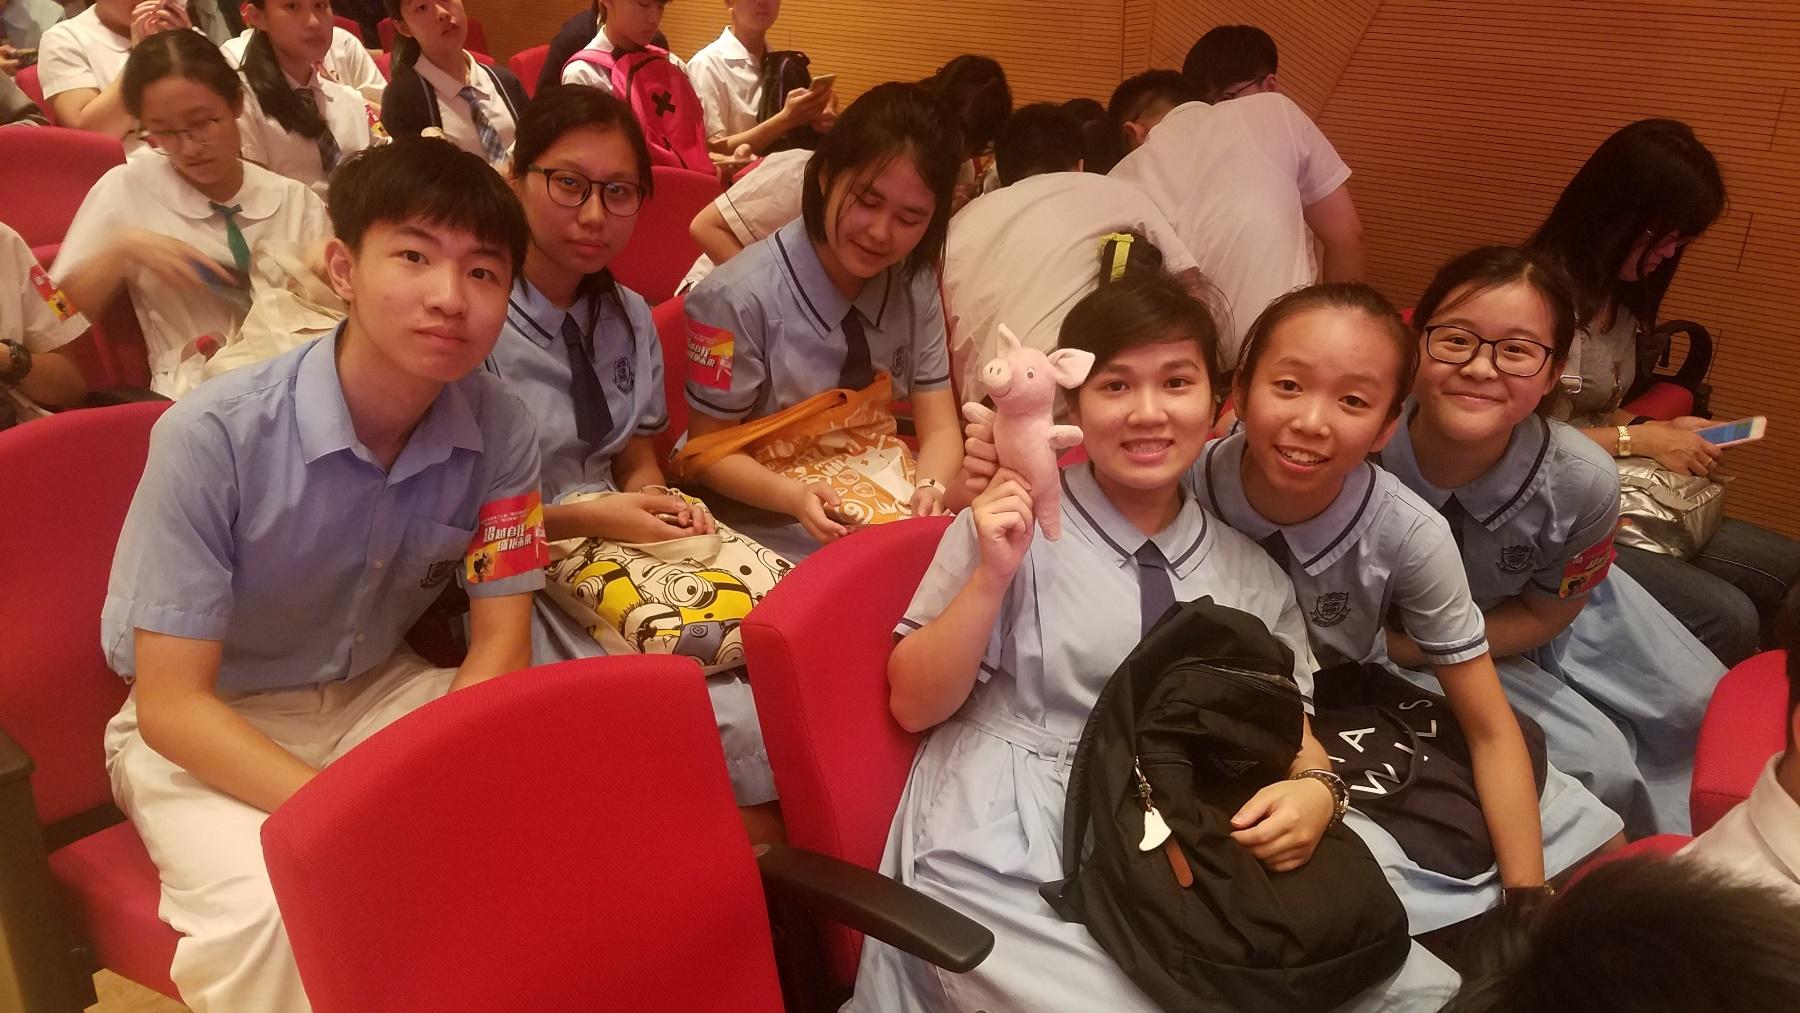 http://www.npc.edu.hk/sites/default/files/20170705_141335.jpg